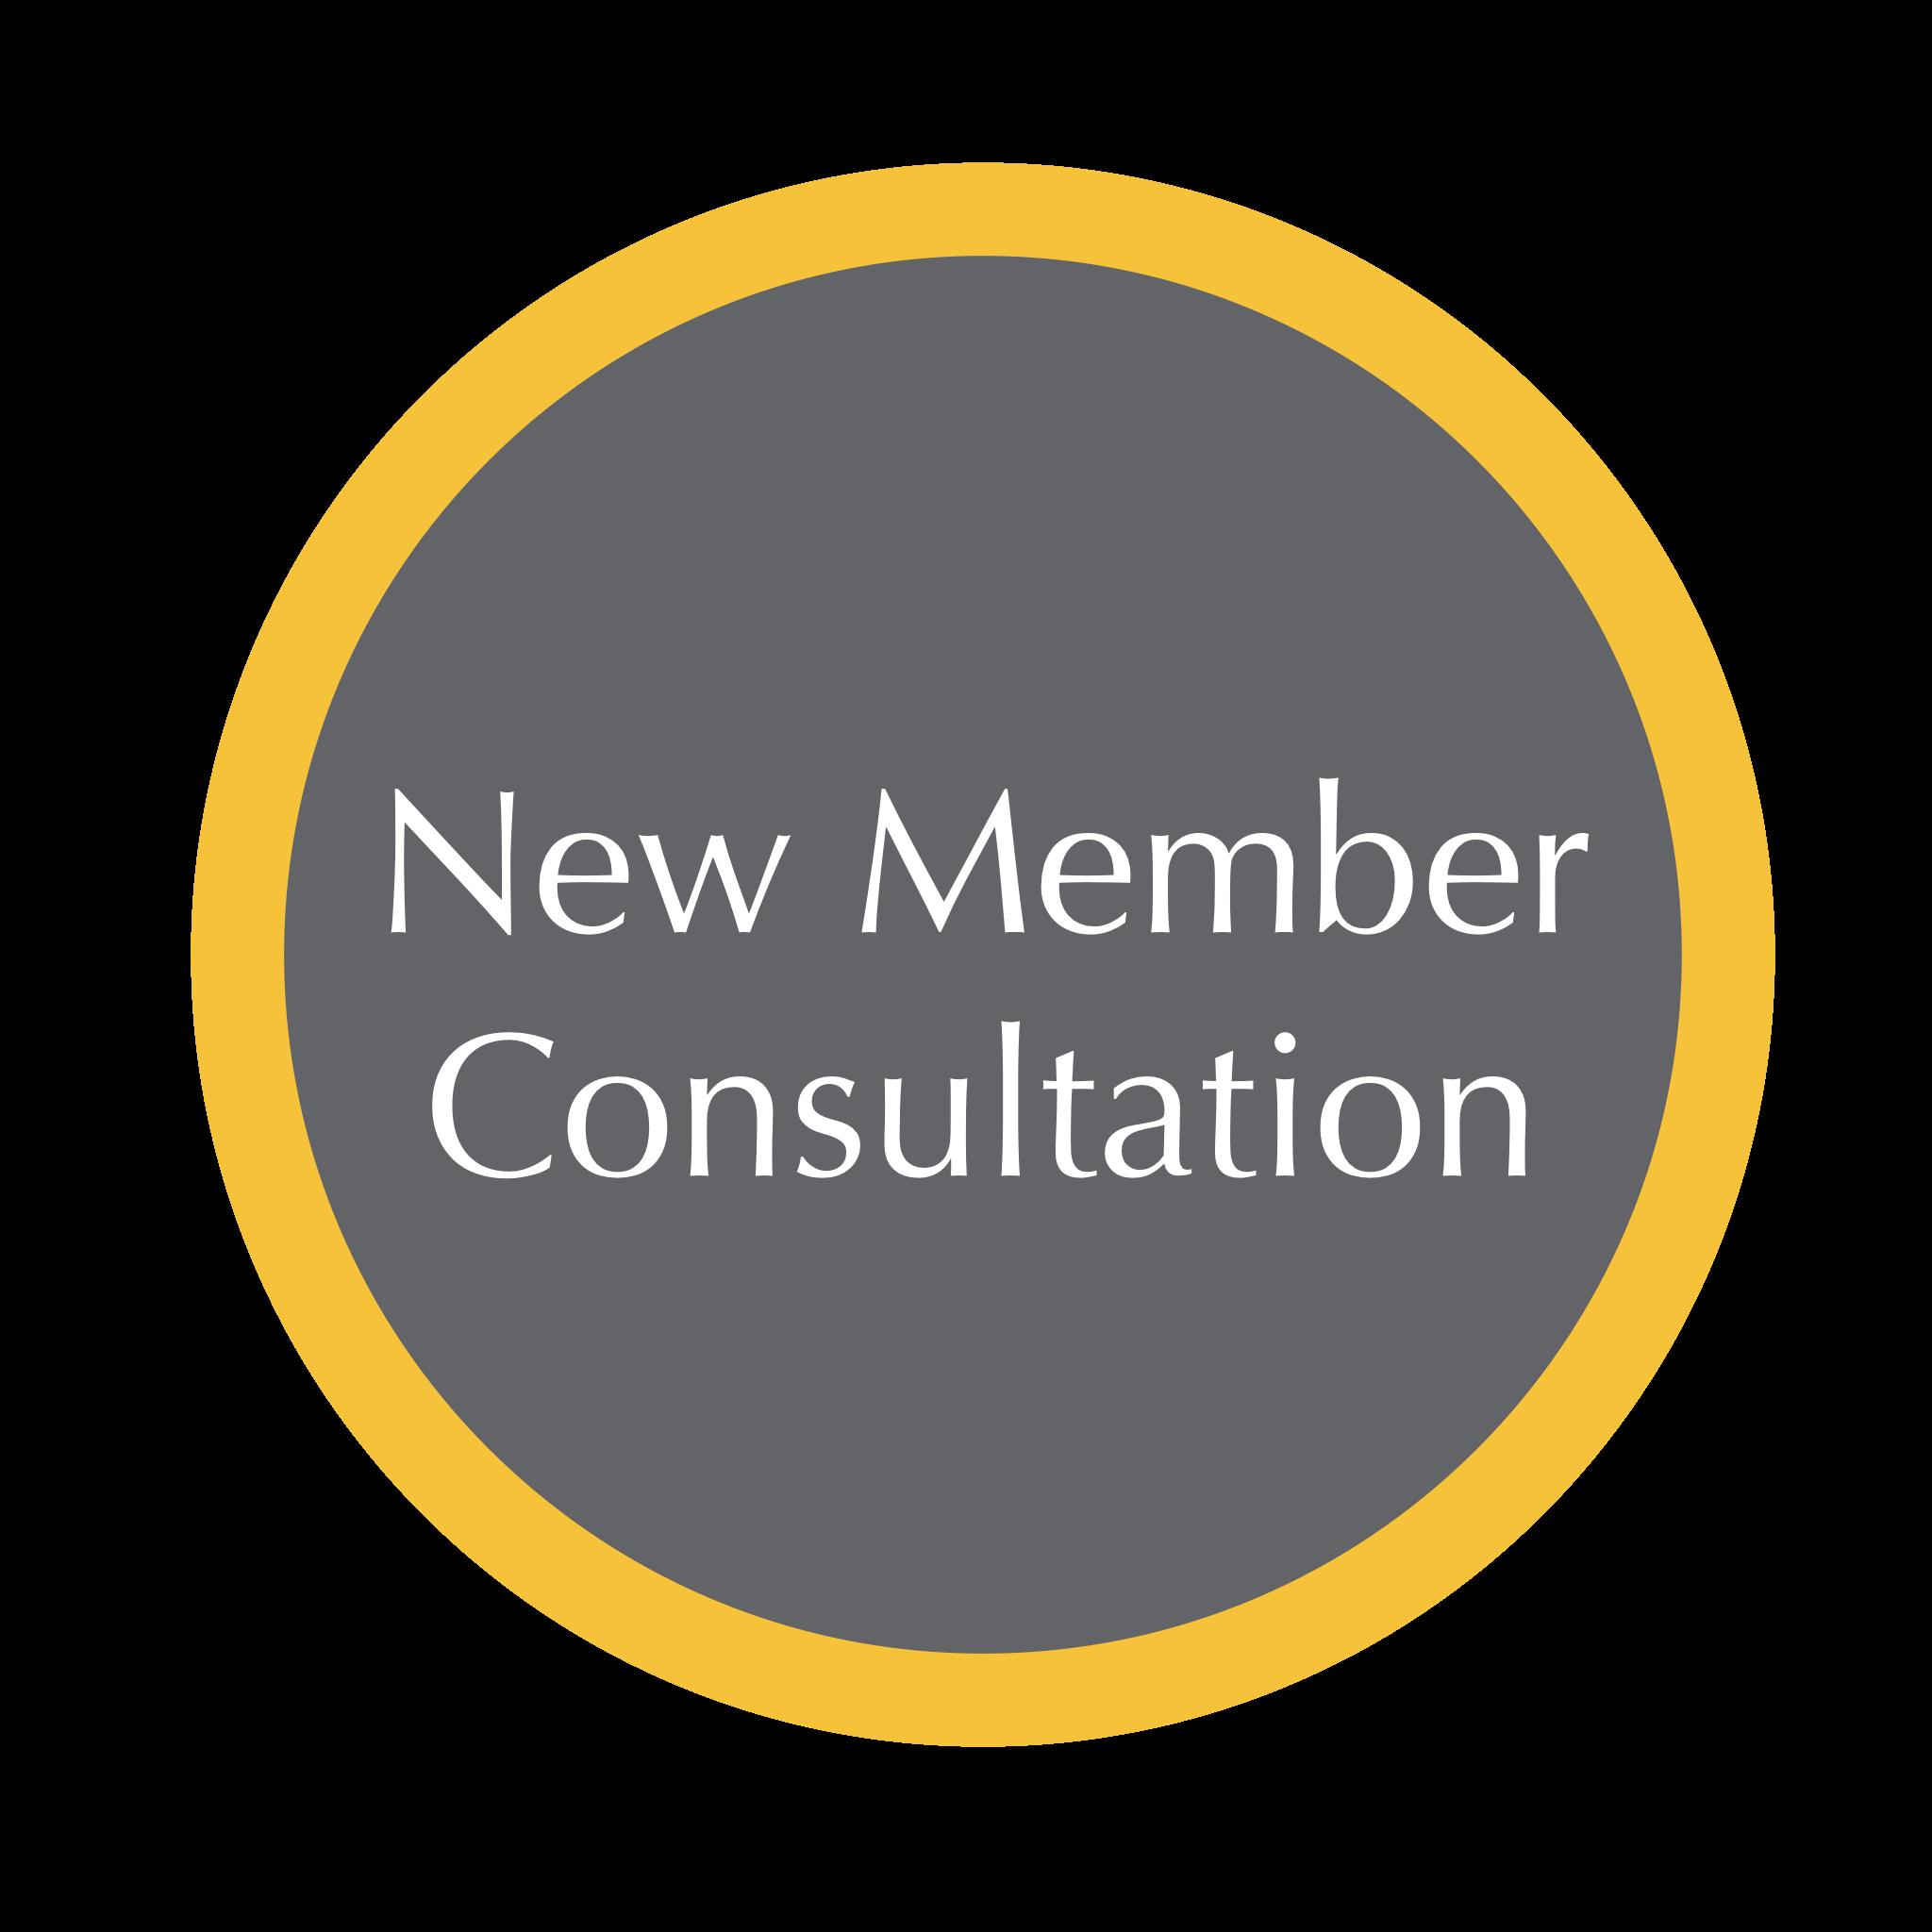 New Member Consultation